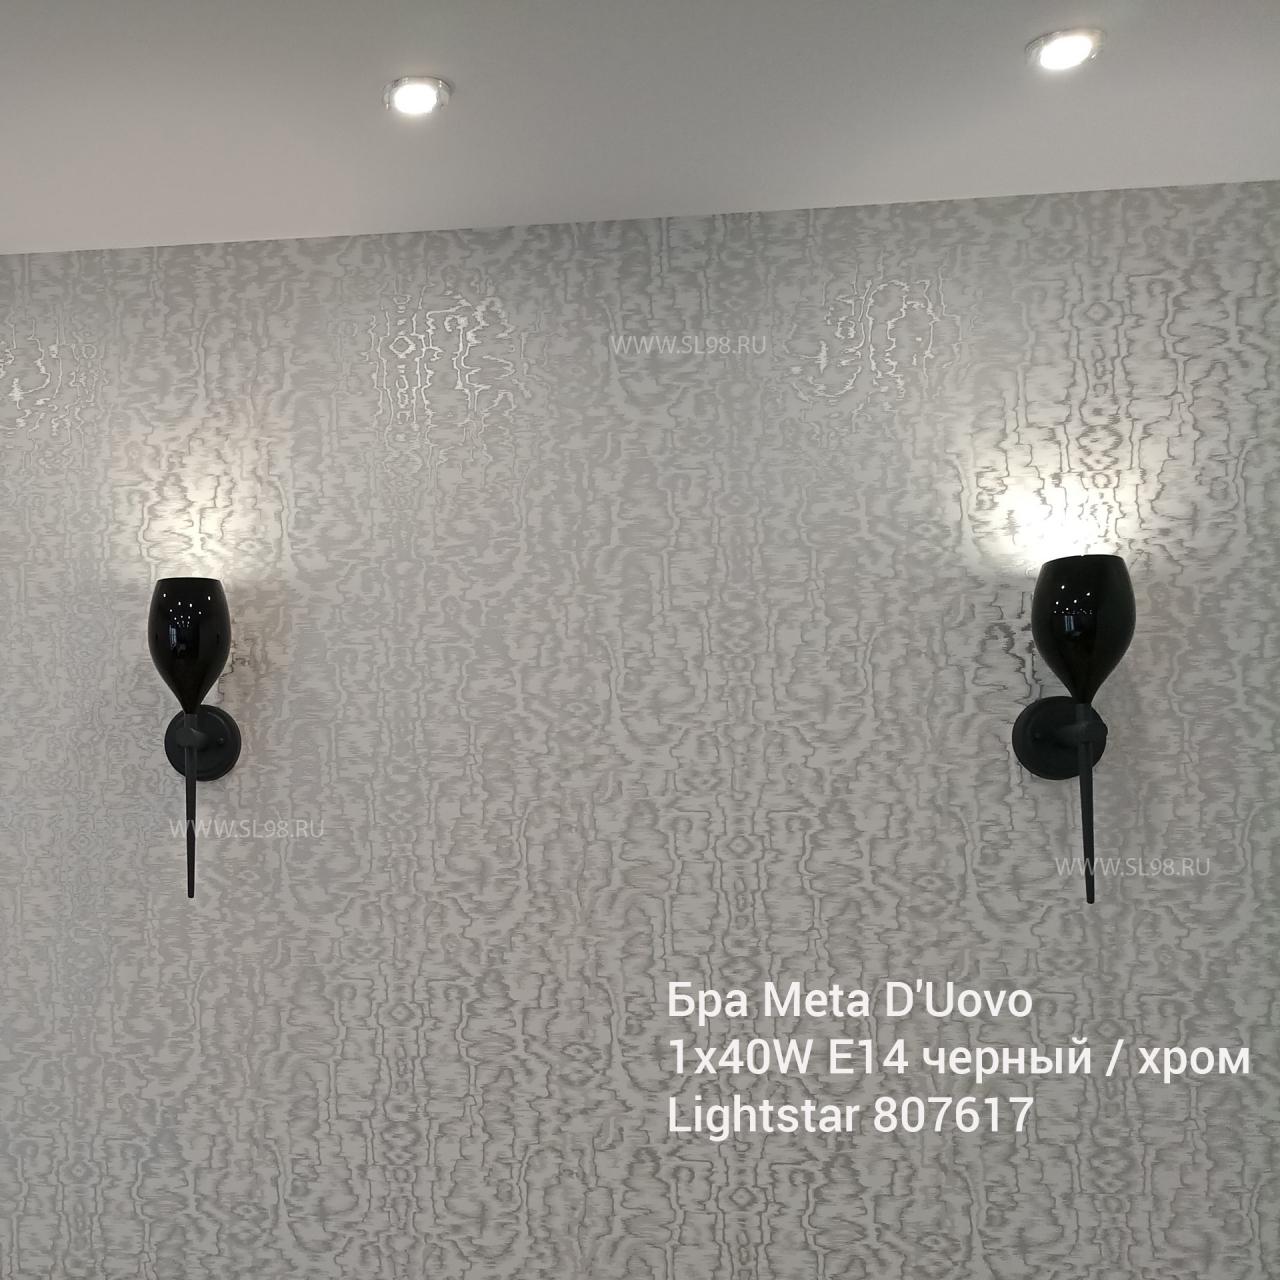 Бра в интерьере: Бра Meta D'Uovo 1х40W E14 черный / хром Lightstar 807617